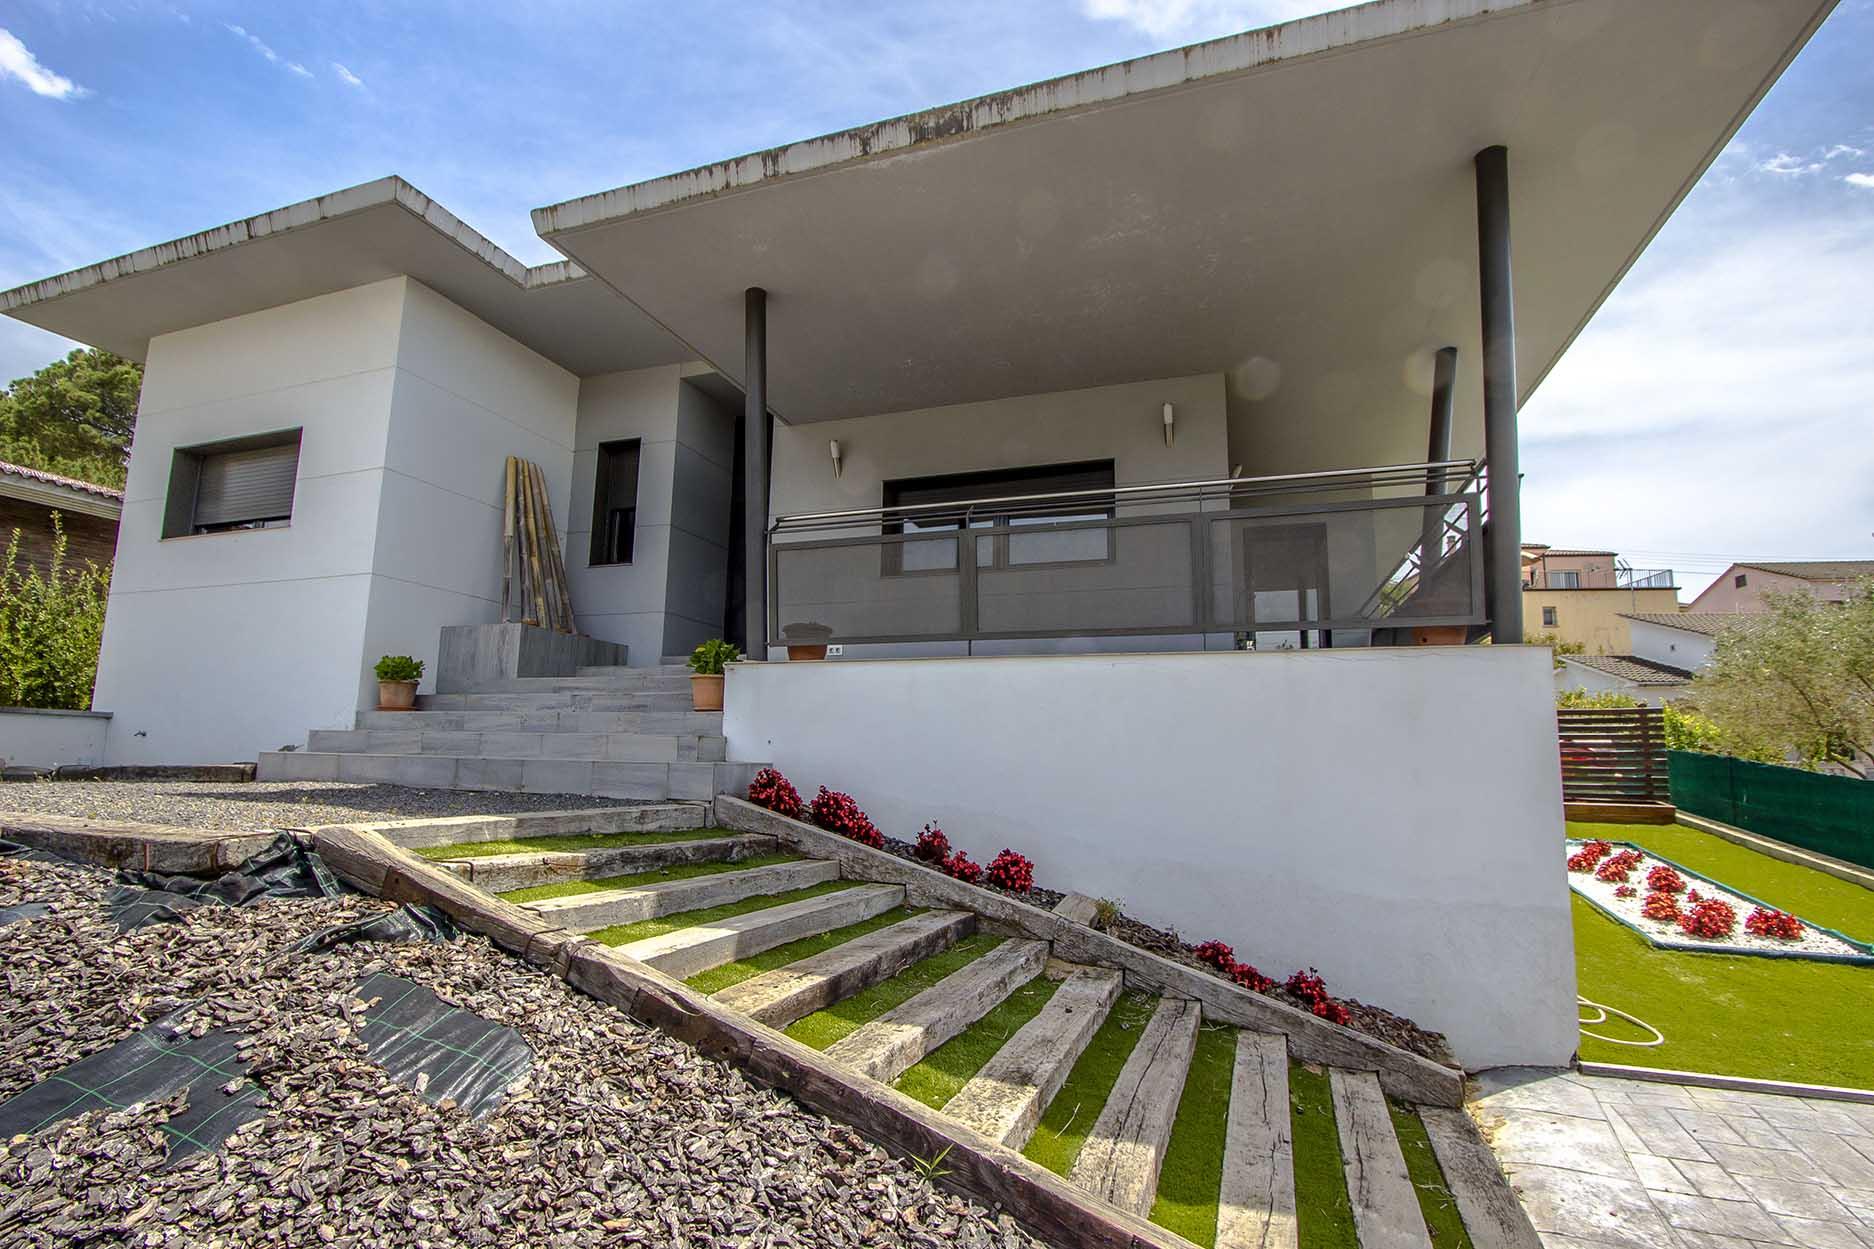 Ferienhaus Catalunya Casas: Modern villa in Sils, 15 min drive to Costa Brava beaches! (1902227), Les Mallorquines, Girona, Katalonien, Spanien, Bild 25